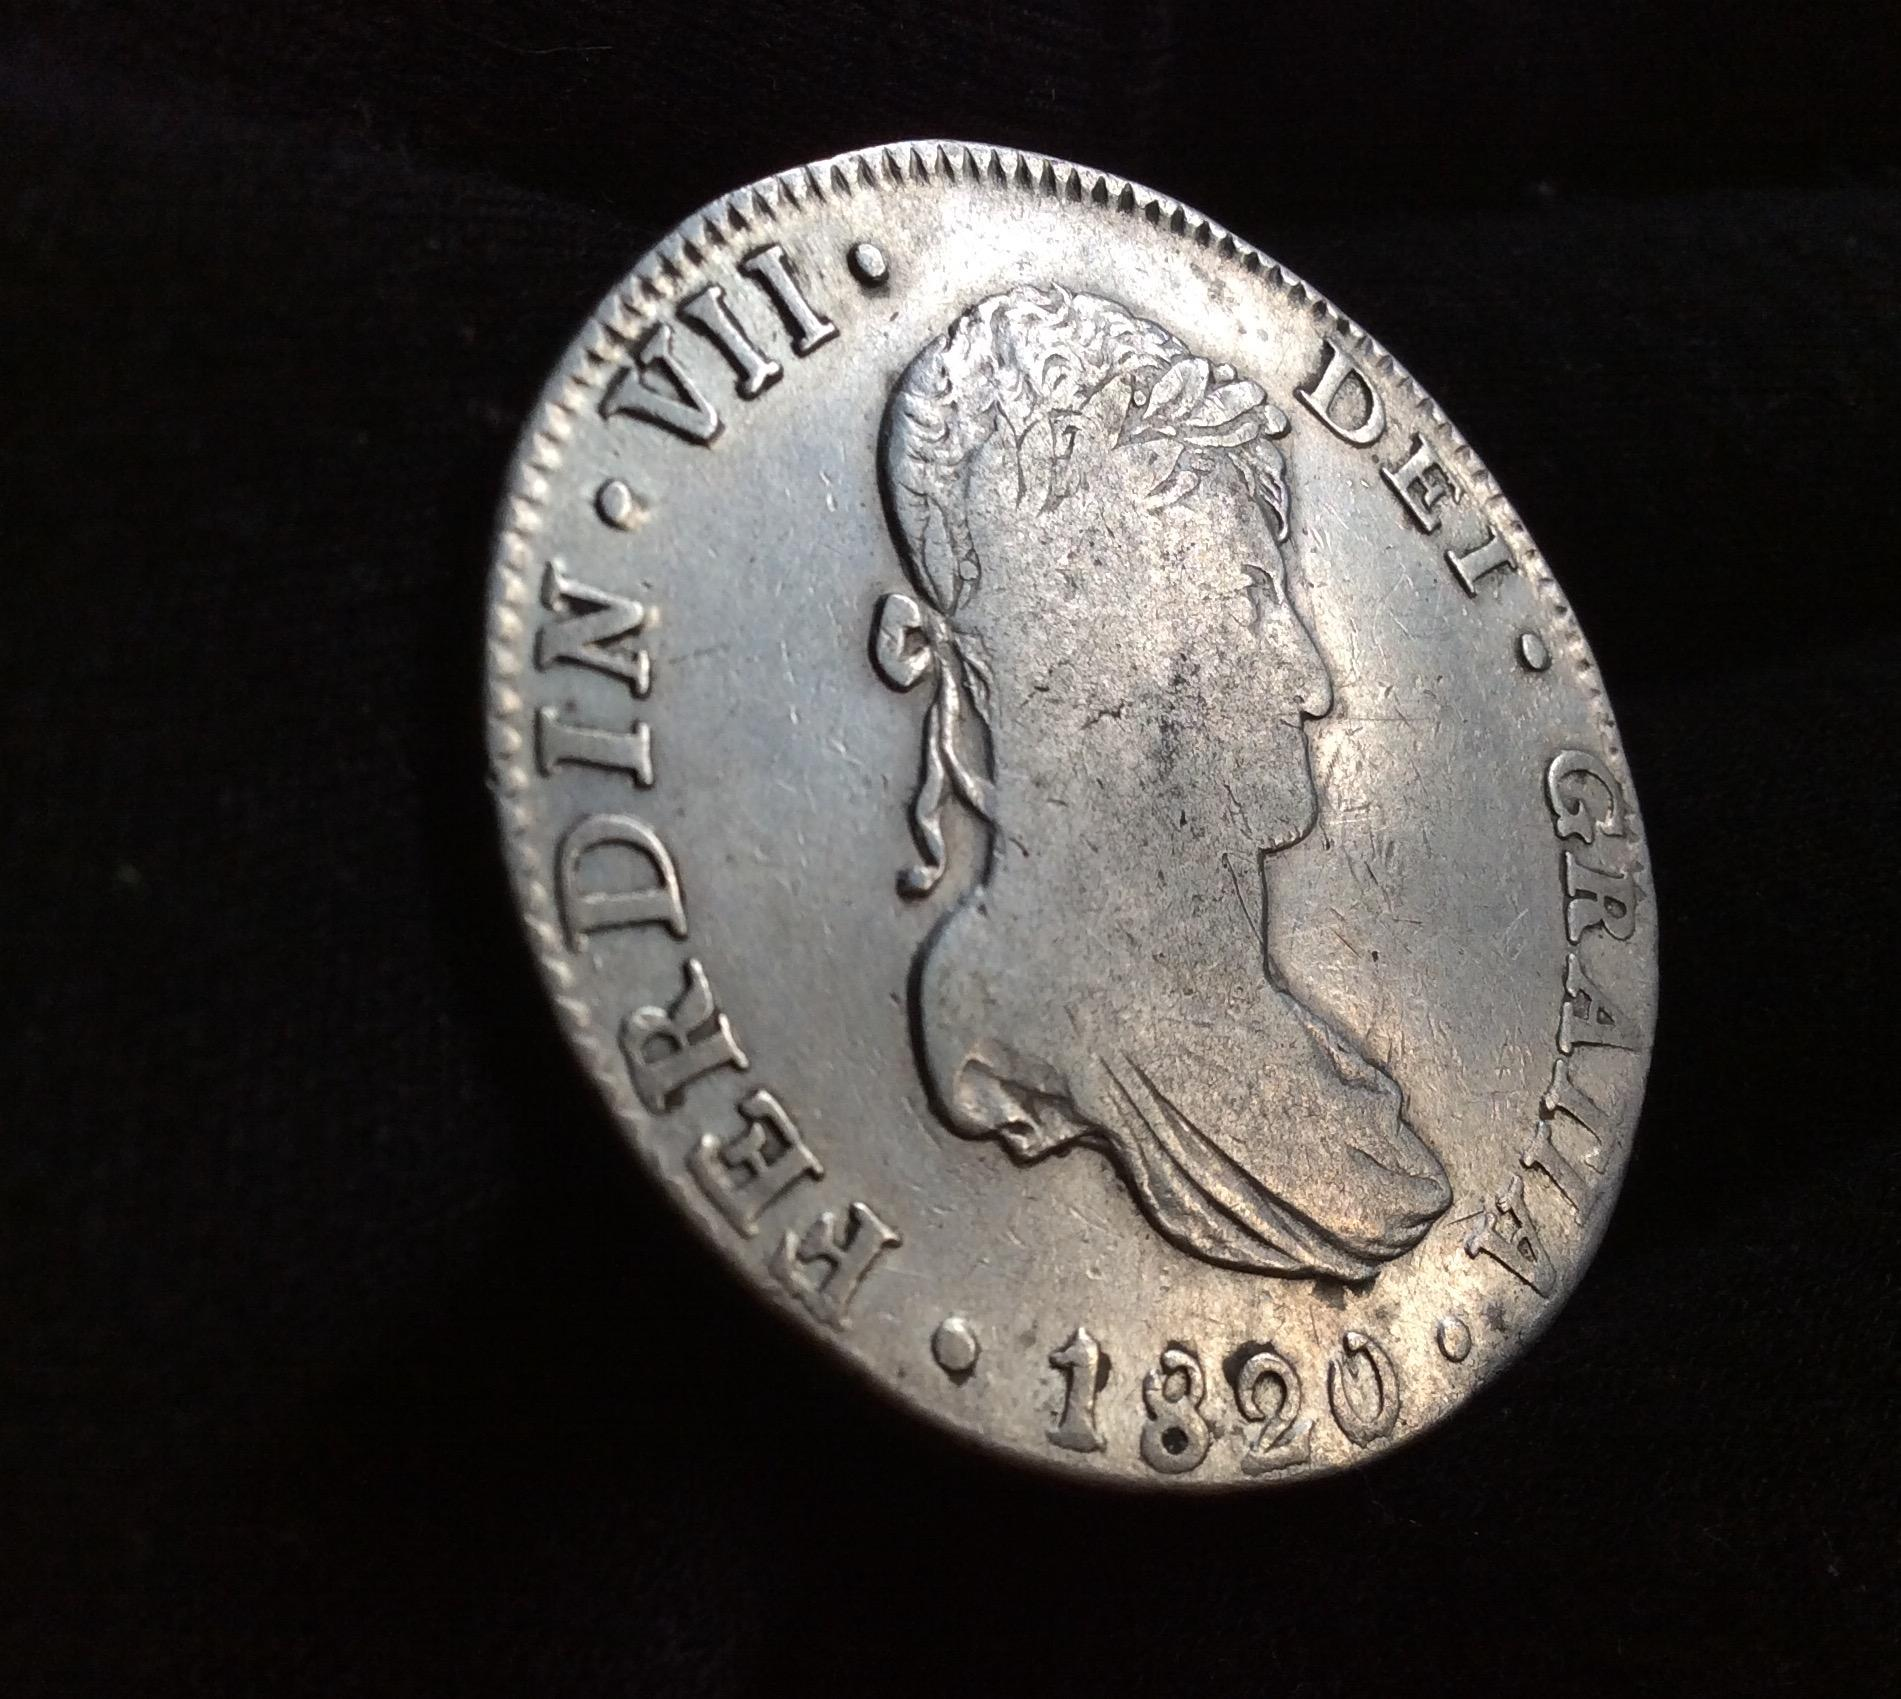 8 REALES 1820 - MÉXICO - FERNANDO VII